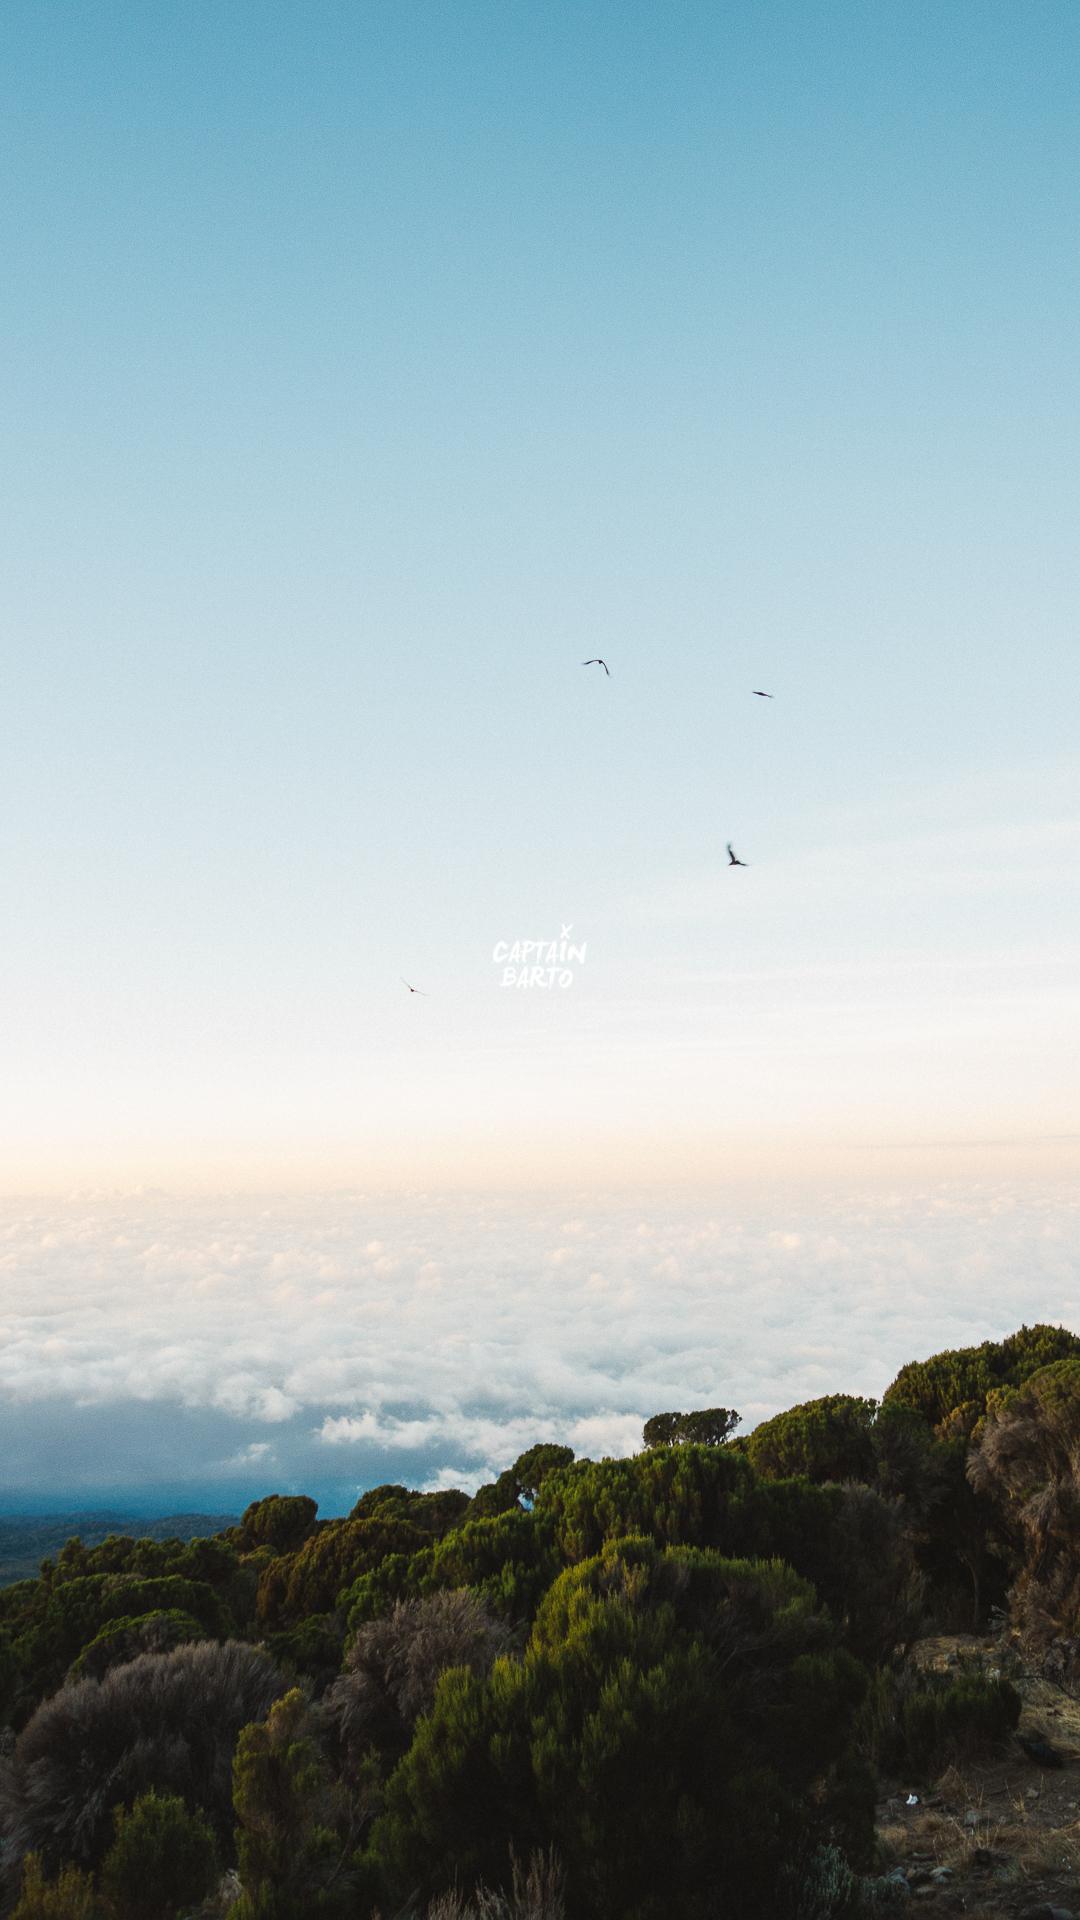 captainbarto-blog-wallpaper-climbing-mtkilimanjaro-110817-8.jpg